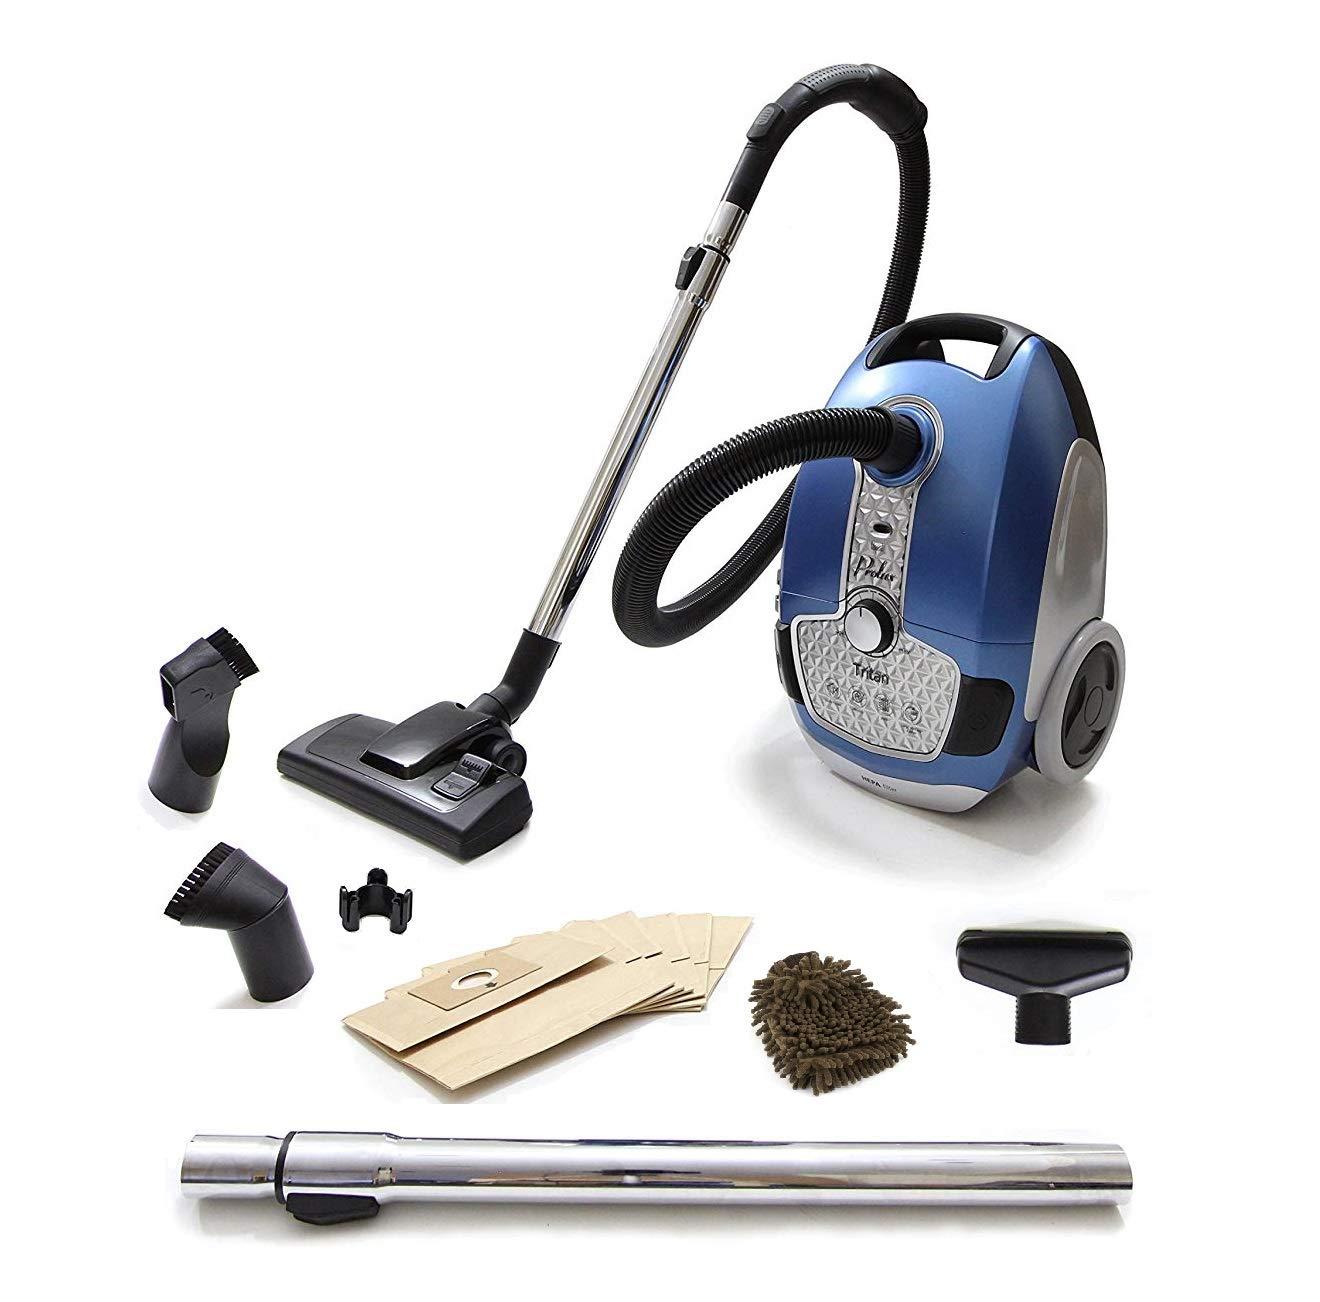 Prolux Tritan Vacuum Cleaner, Canister Pet Turbo, HEPA (Complete Set) w/Bonus: Premium Microfiber Cleaner Bundle